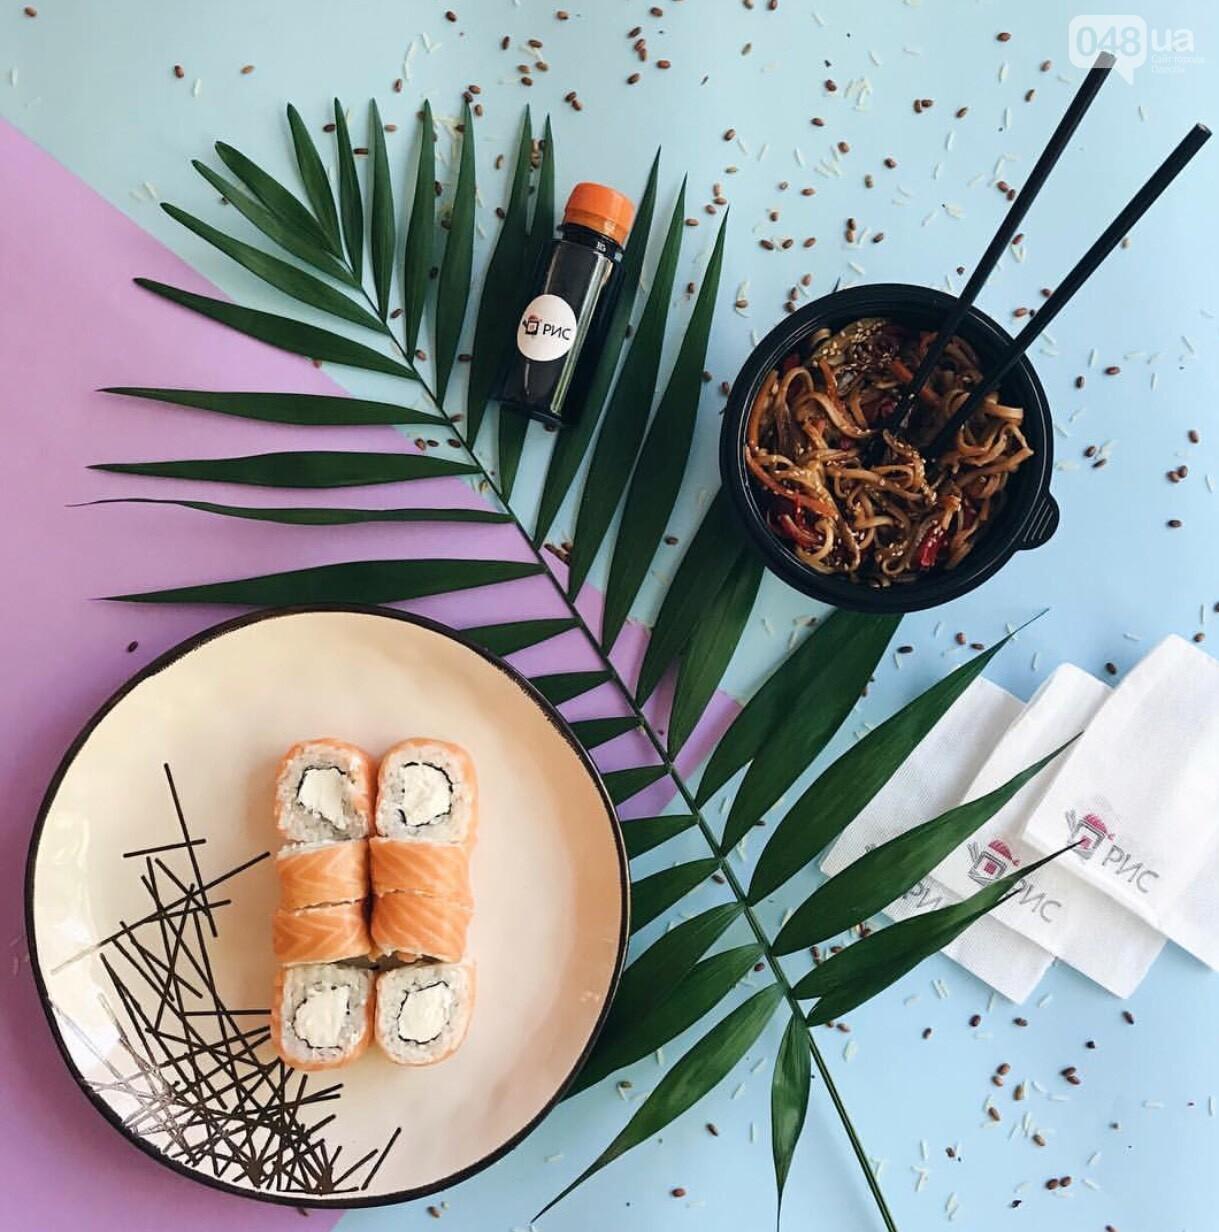 ris.od.ua - японская кухня у вас дома!, фото-1